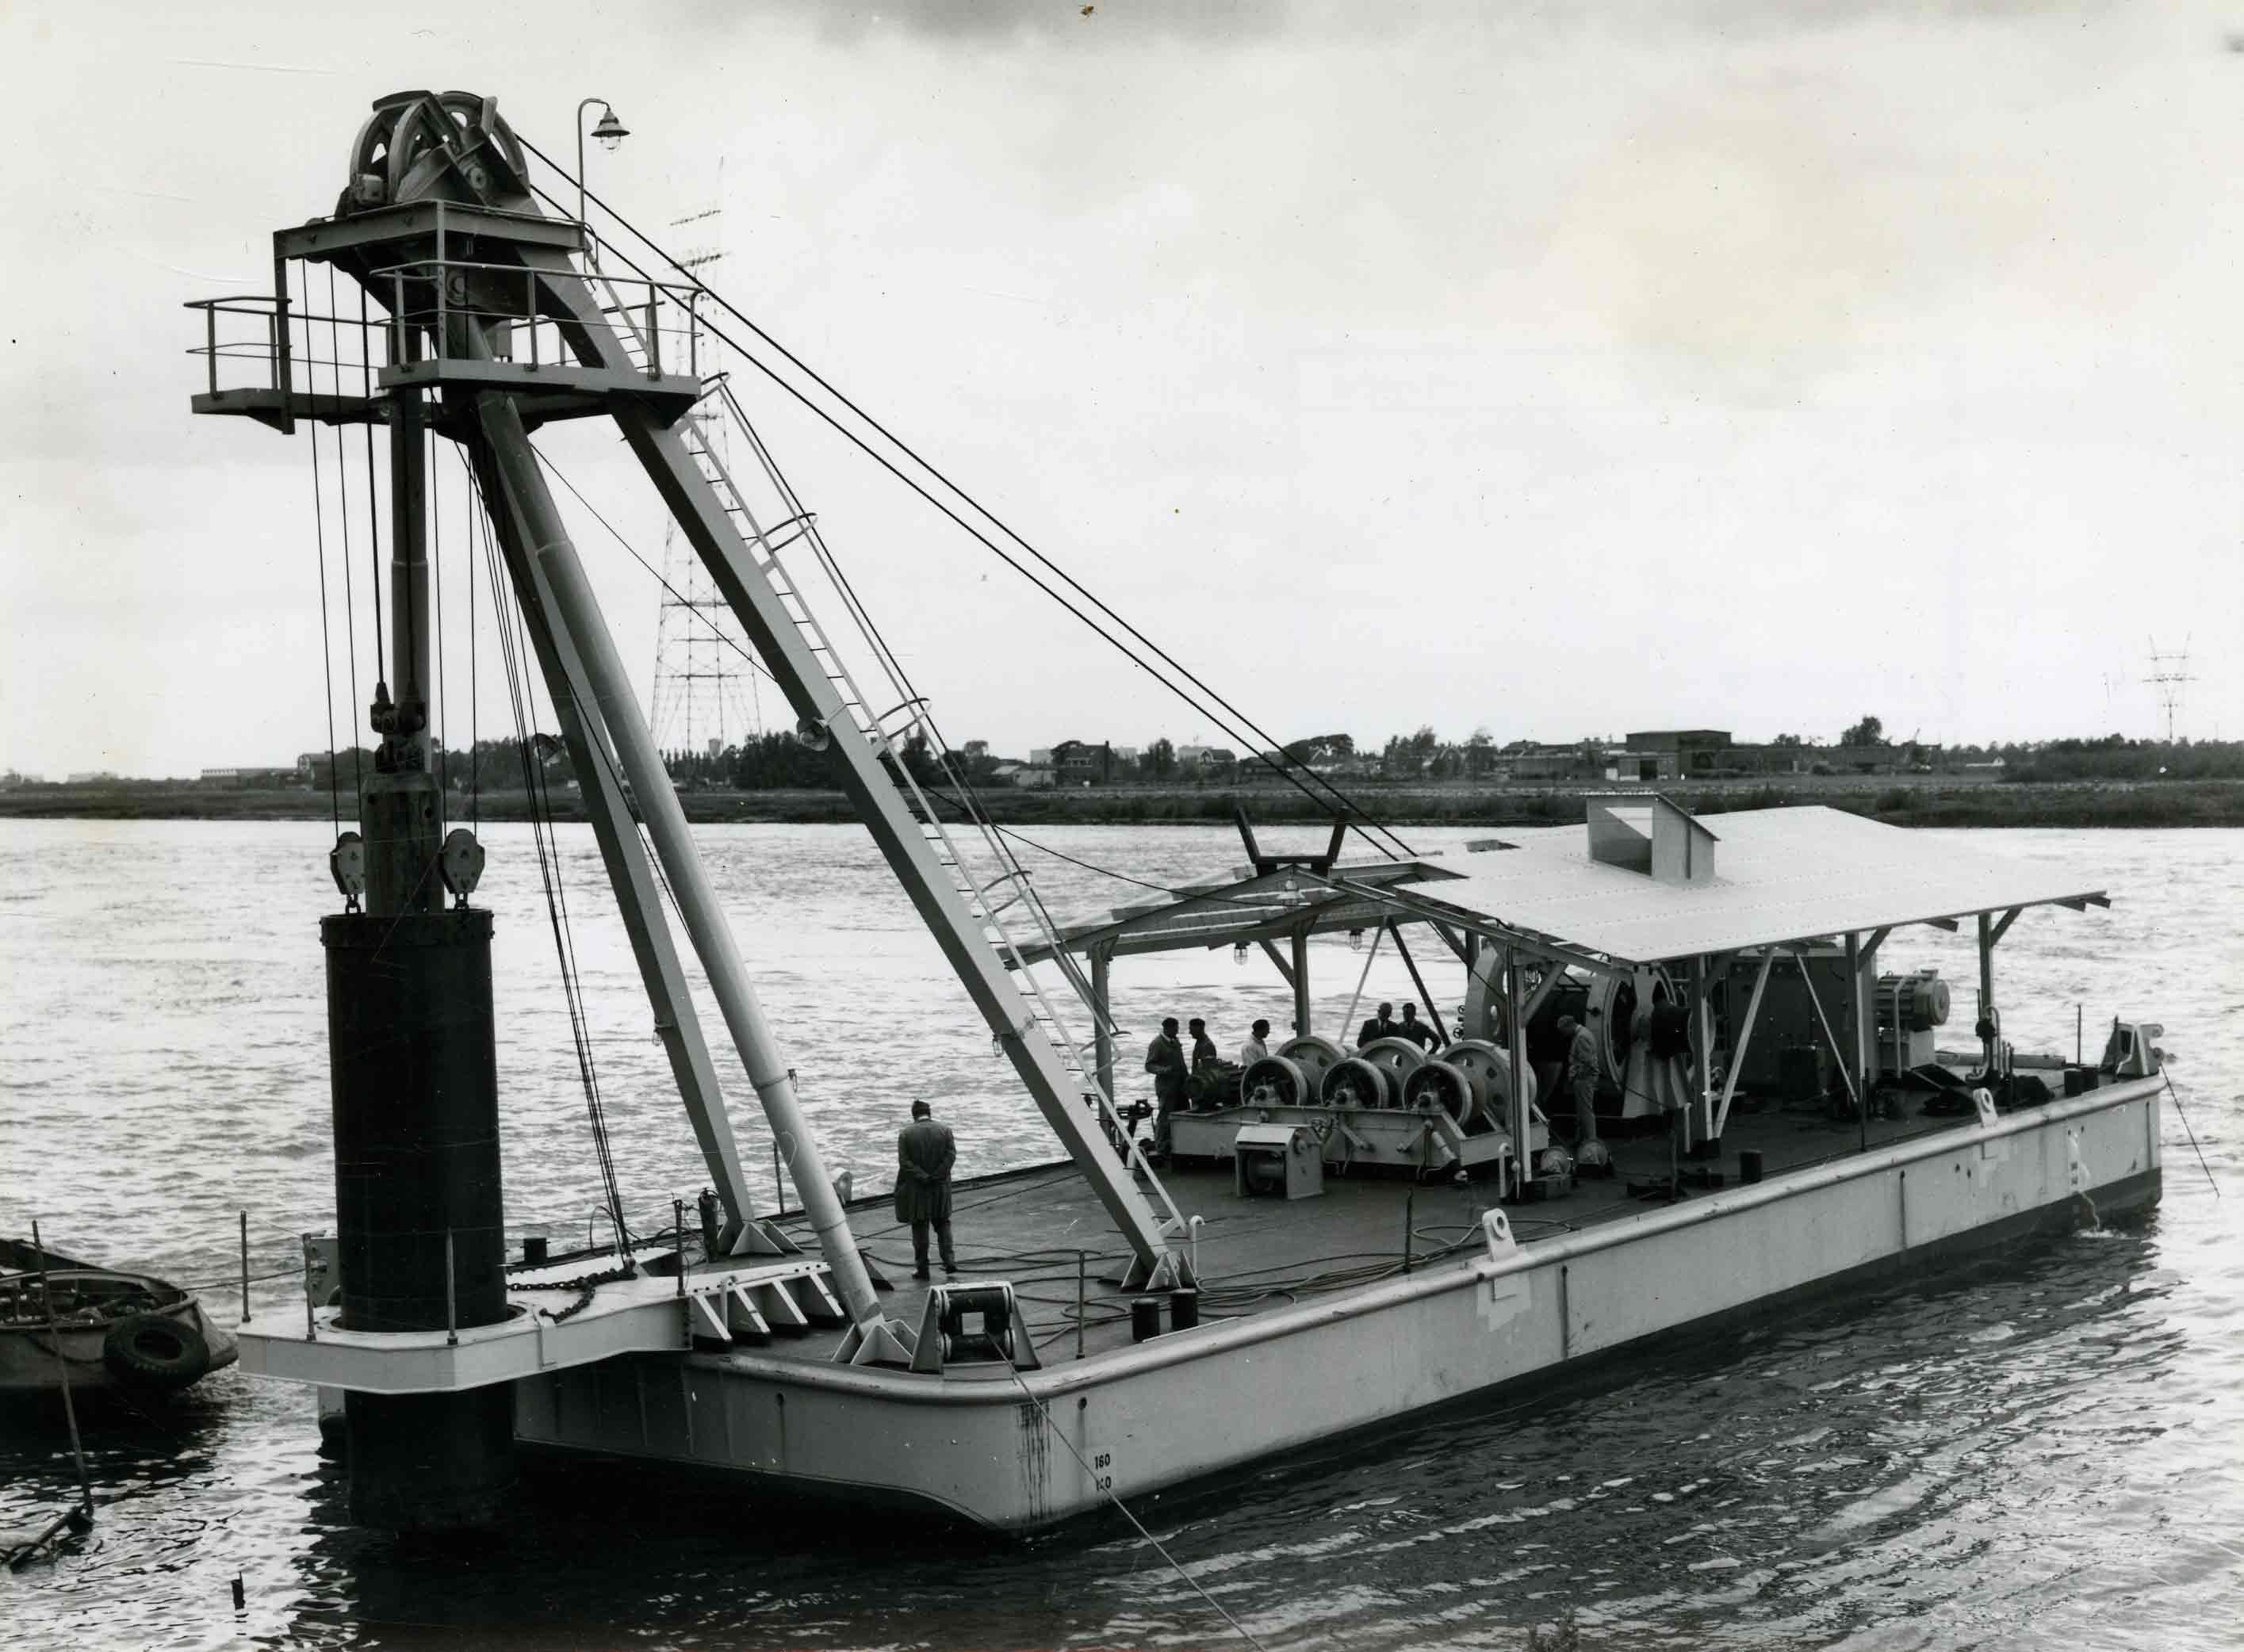 Bnr. 349: Alfil (1967) (Co. 577)